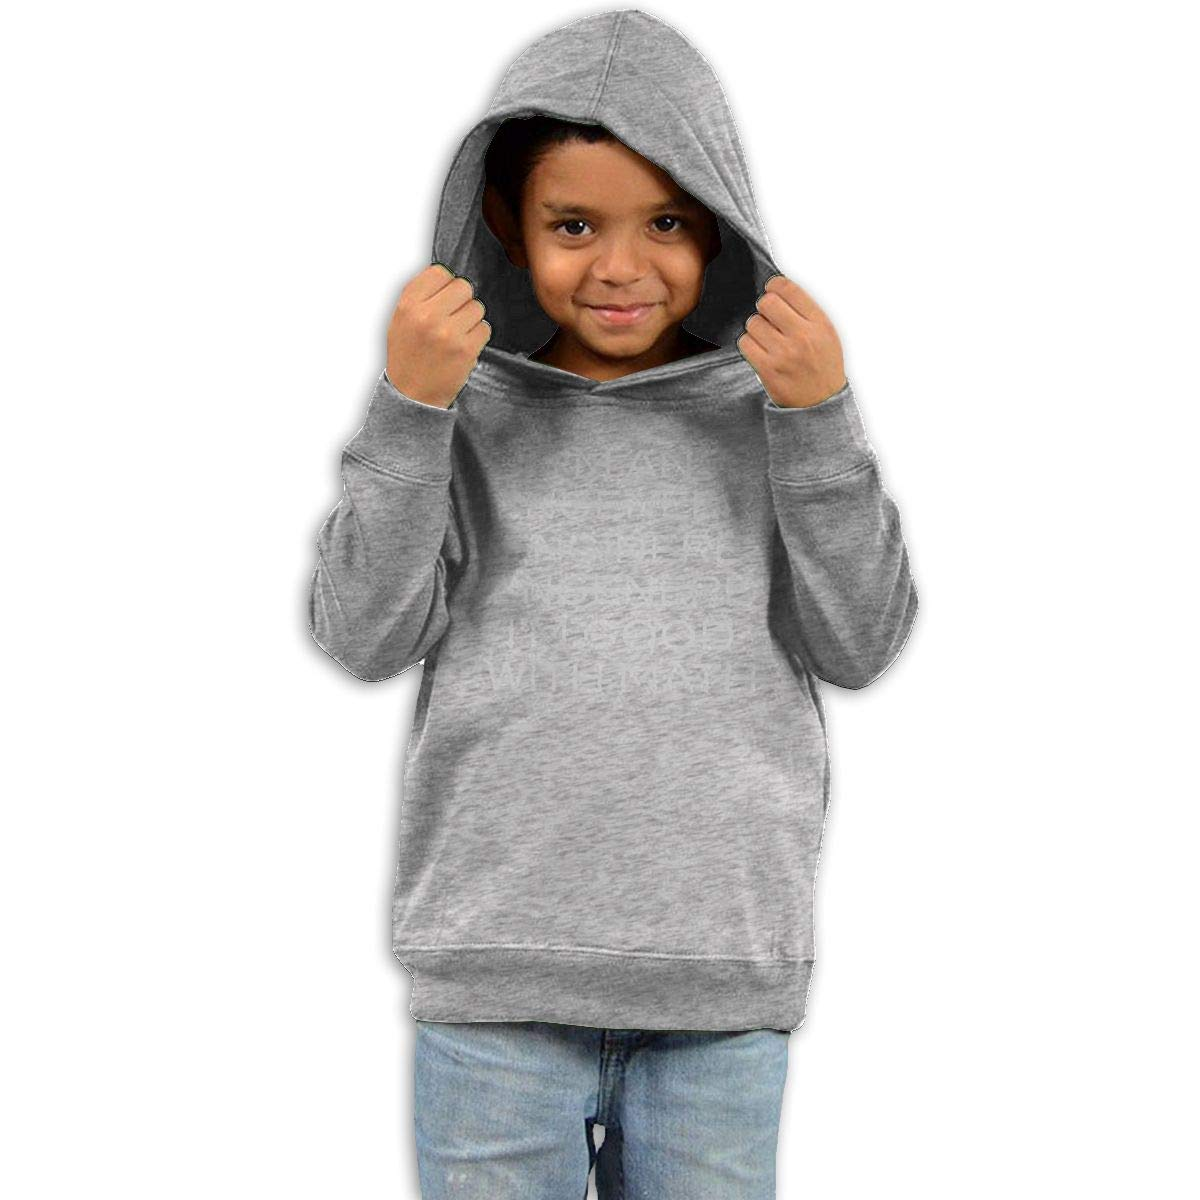 Childrens Hooded Sweater Im an Engineer Im Good at Math Boy Sweater Black